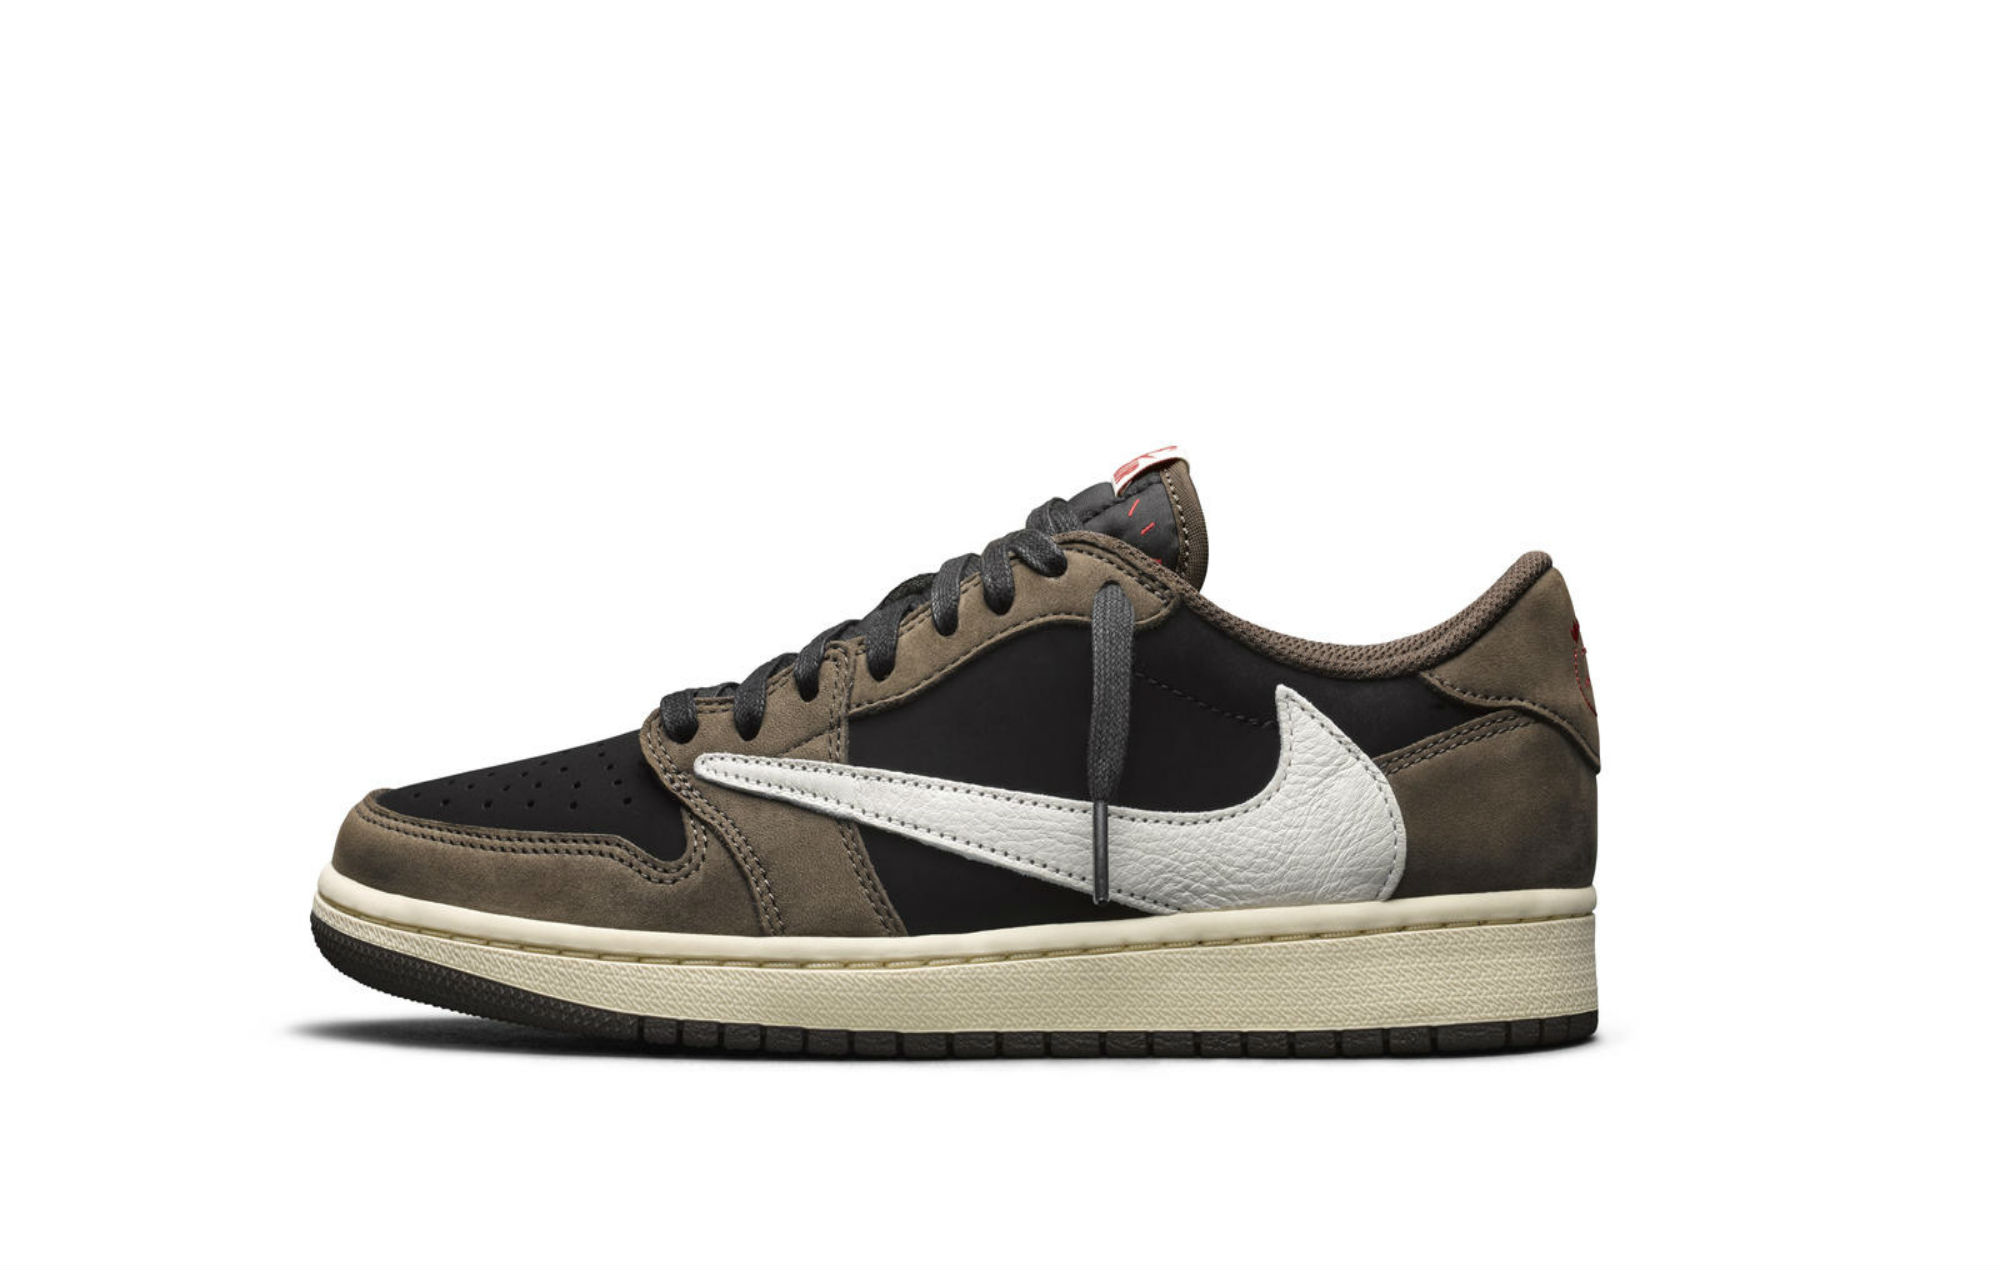 a7aeb3d1 Nike announces release date for latest Travis Scott sneaker ...